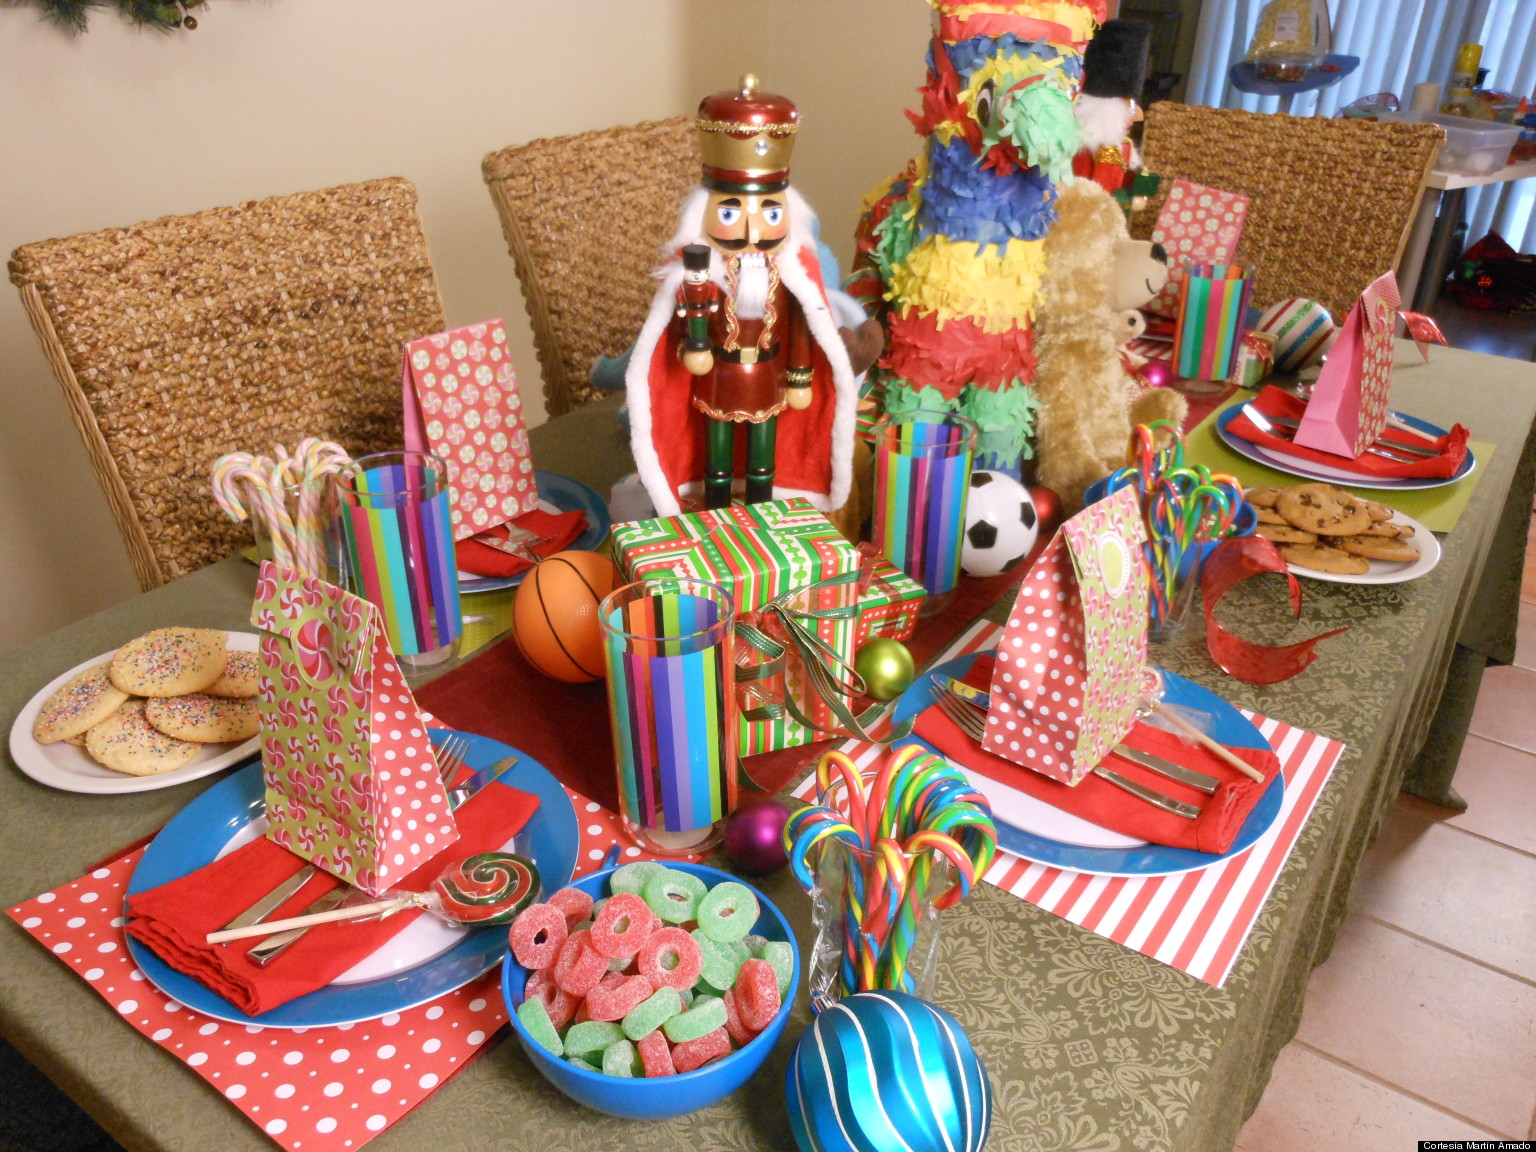 c mo decorar tu mesa para los reyes magos fotos huffpost